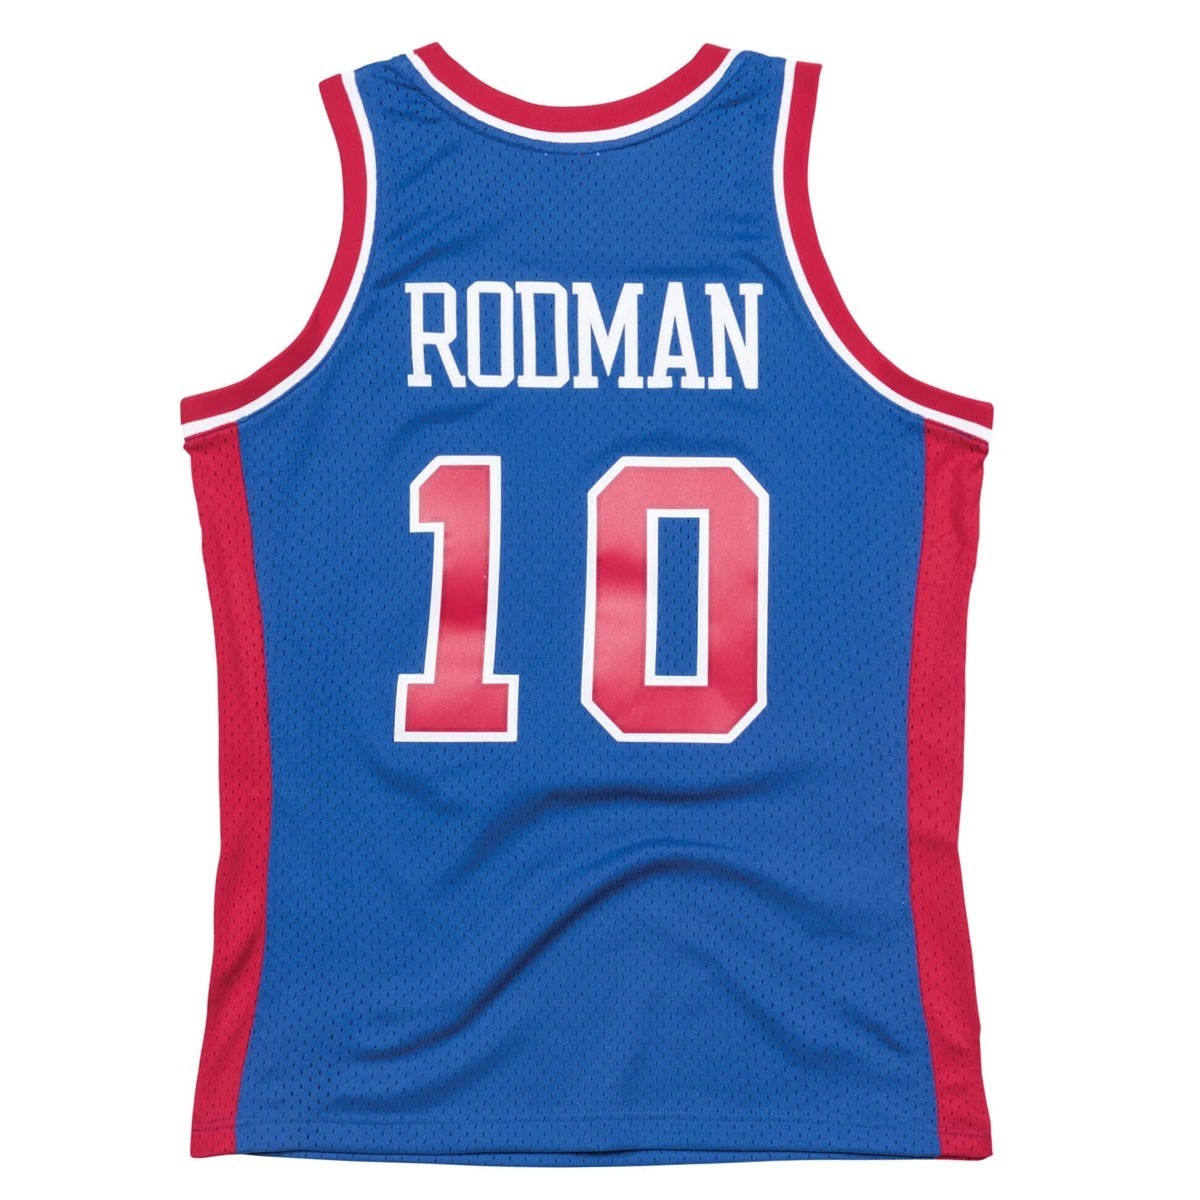 pretty nice 7283e c9ca6 Mitchell & Ness Rodman Swingman Jersey Away 'Pistons'